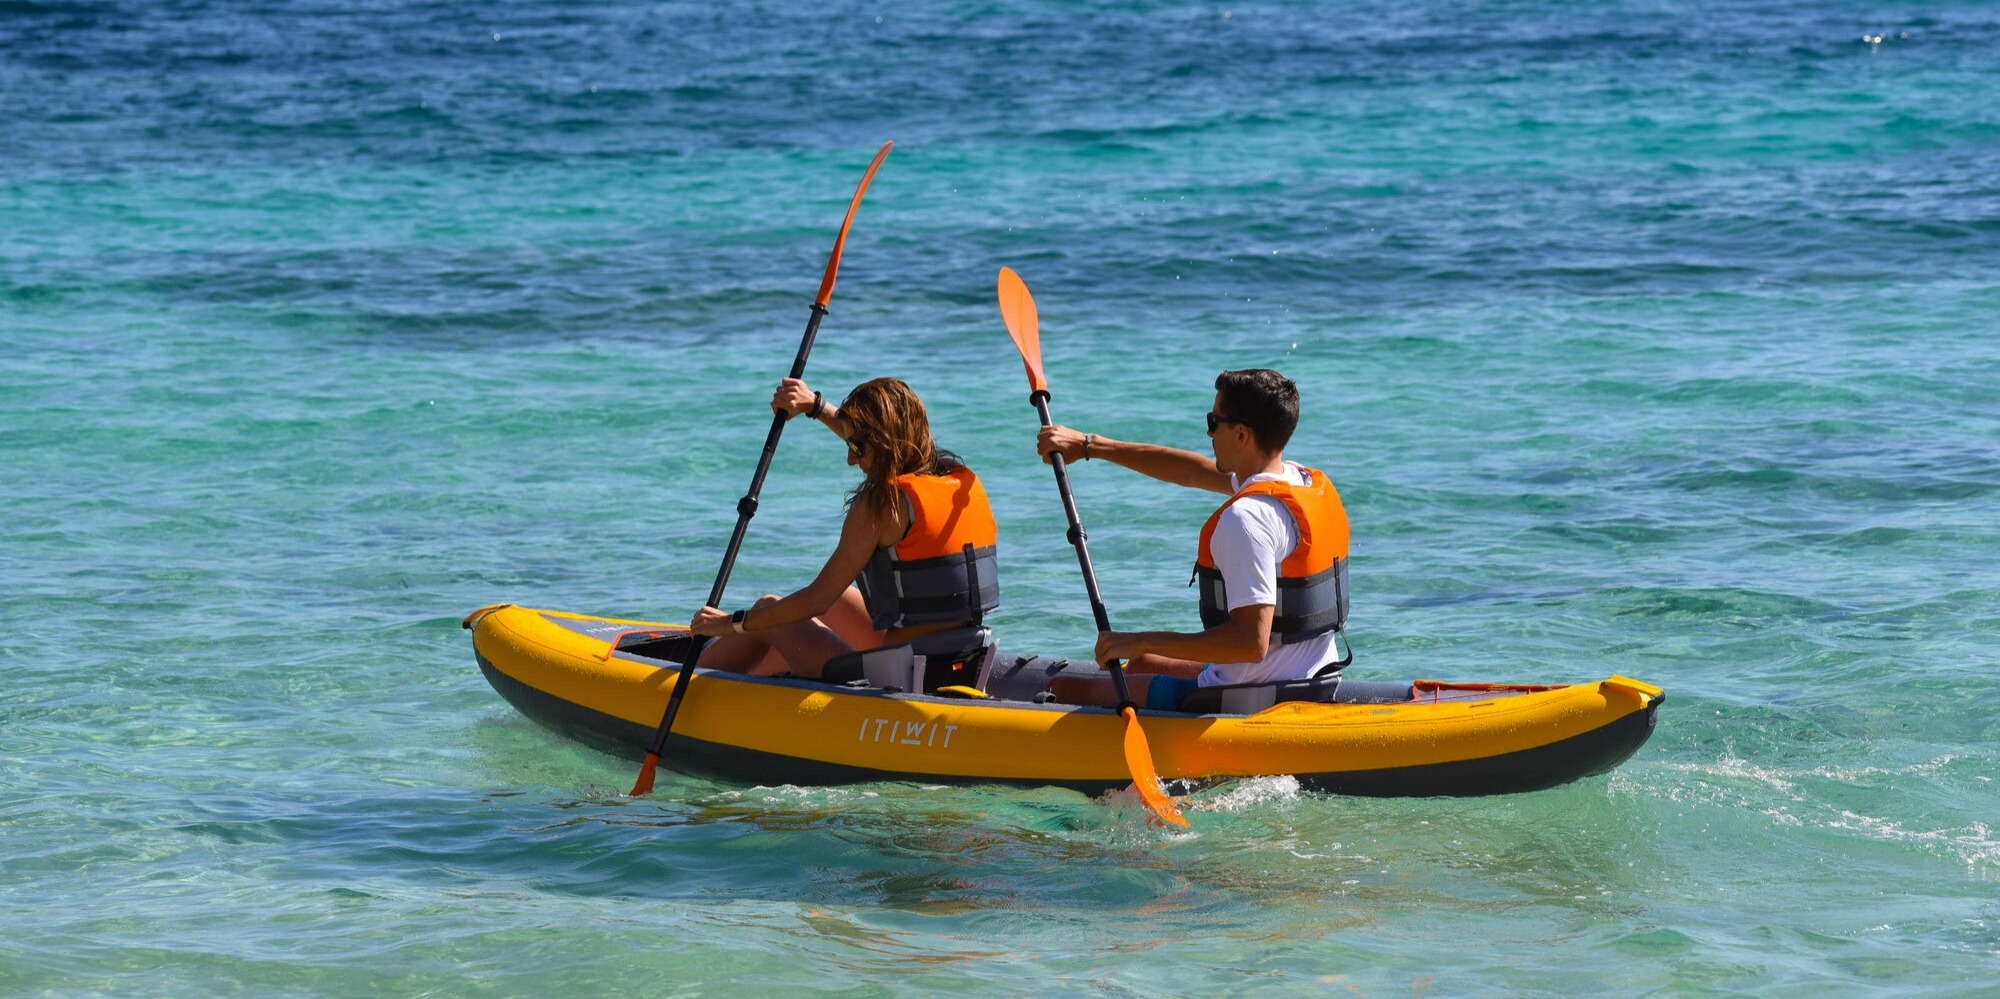 Sea Kayak Image 2.jpg